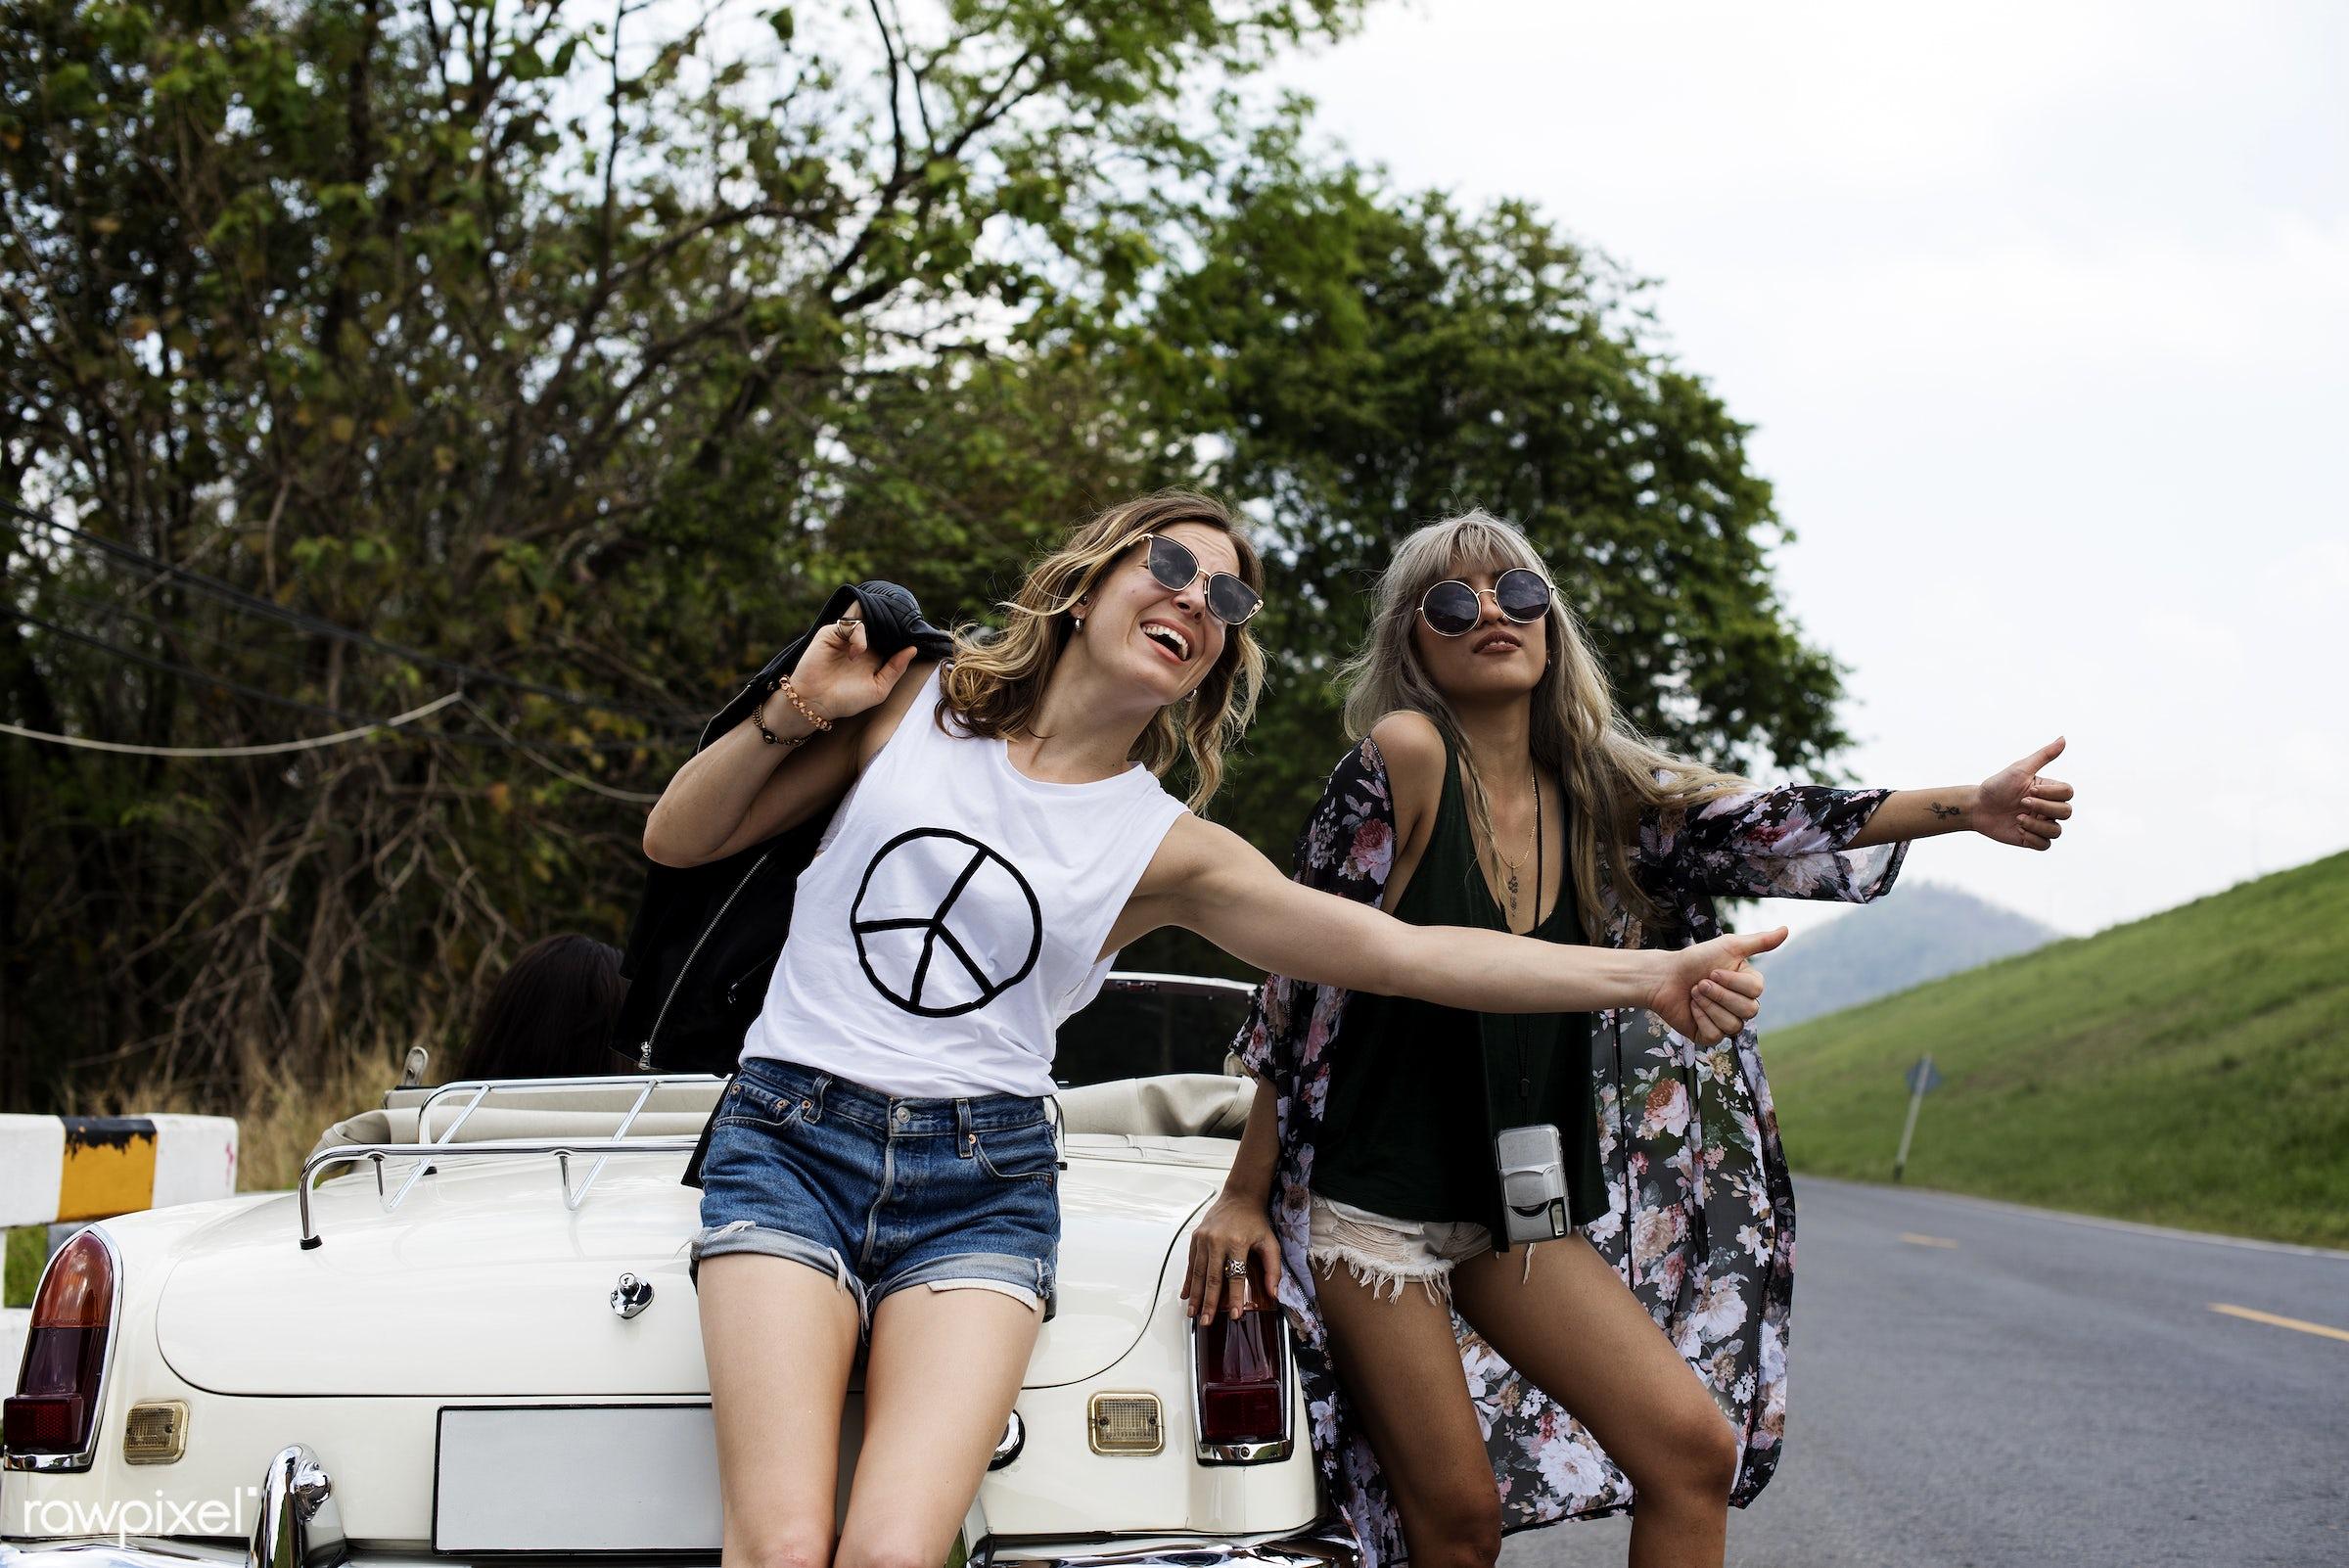 adult, broke, car, comrade, confidant, confidante, diversity, down, friends, friendship, fun, hangout, hills, hitchhike,...